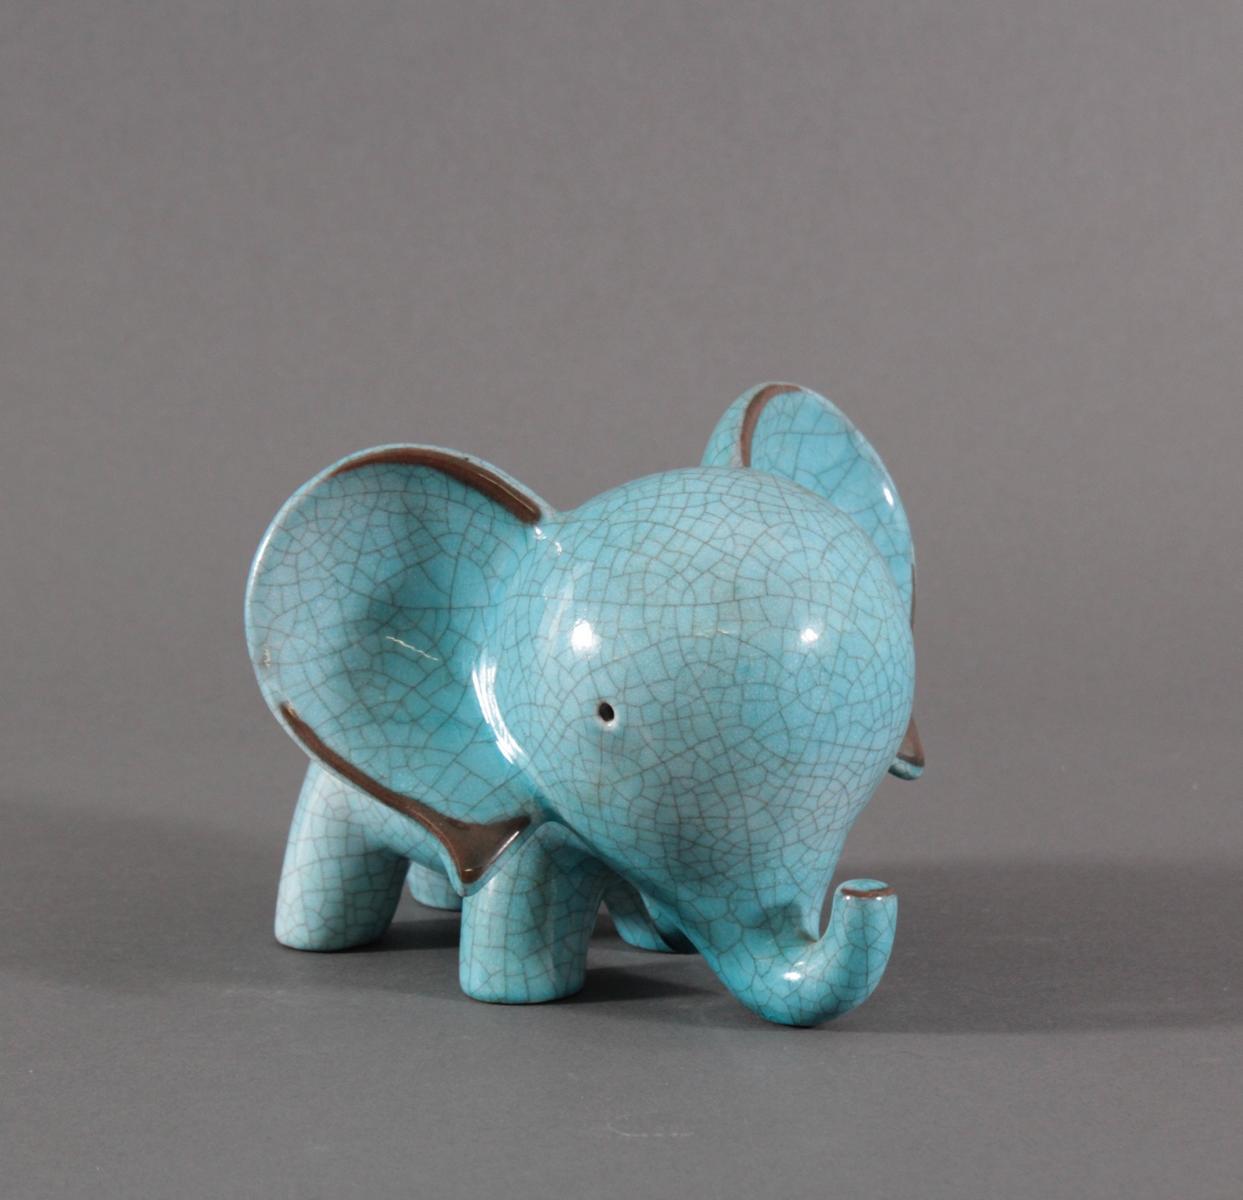 Keramik-Miniaturtierplastik, 'Elefant', Karlsruher Majolika, um 1956-88, Entw.: Walter Bosse